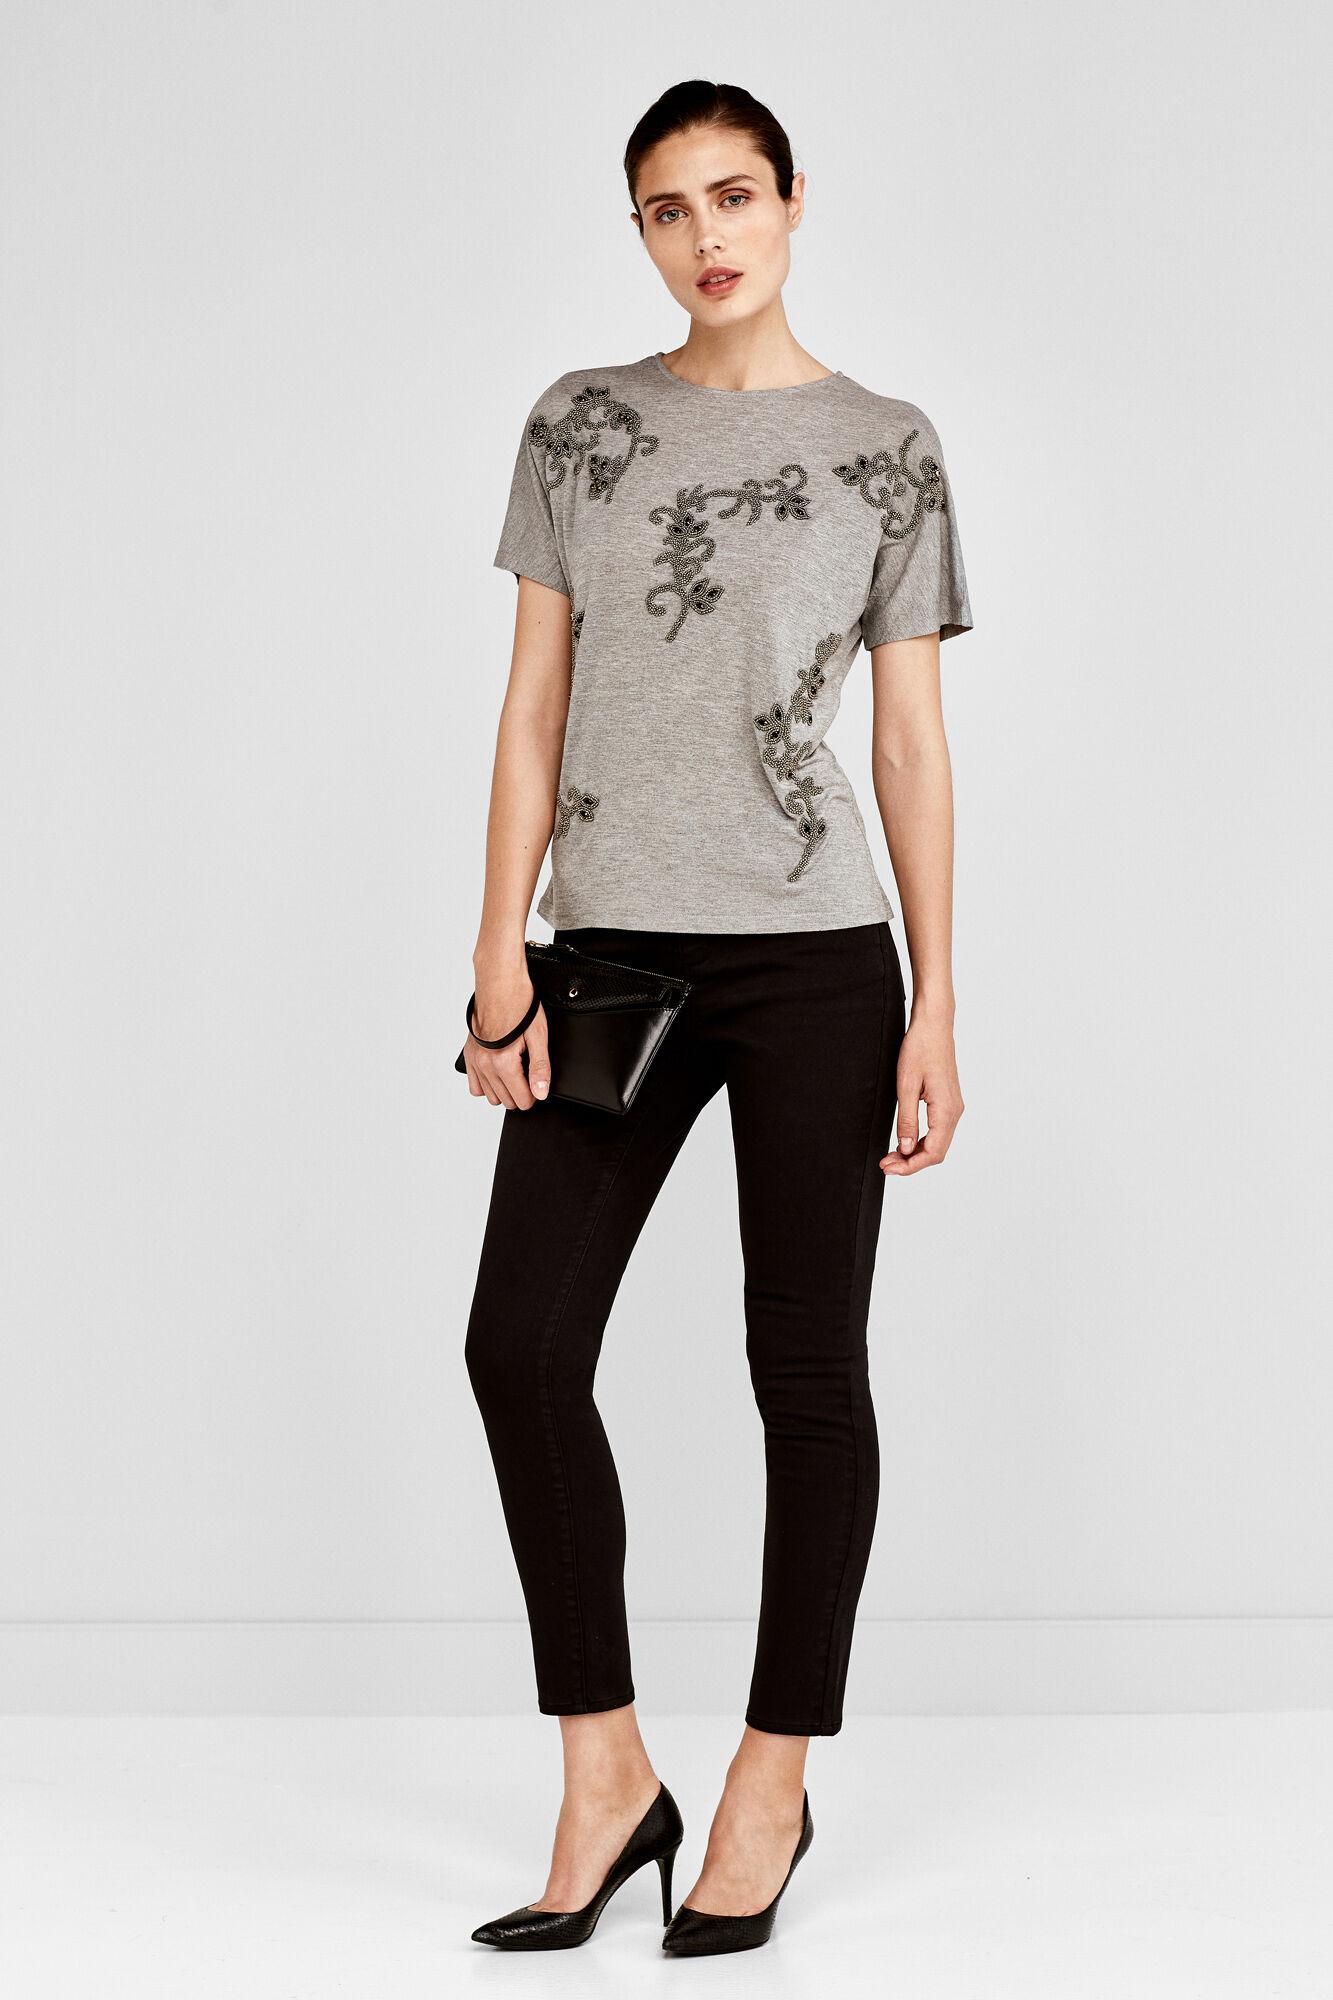 Camisetas Camiseta Fifty Camiseta Pedrería Fifty Fifty Pedrería Camisetas Camisetas Pedrería Camiseta qnwgPC4S